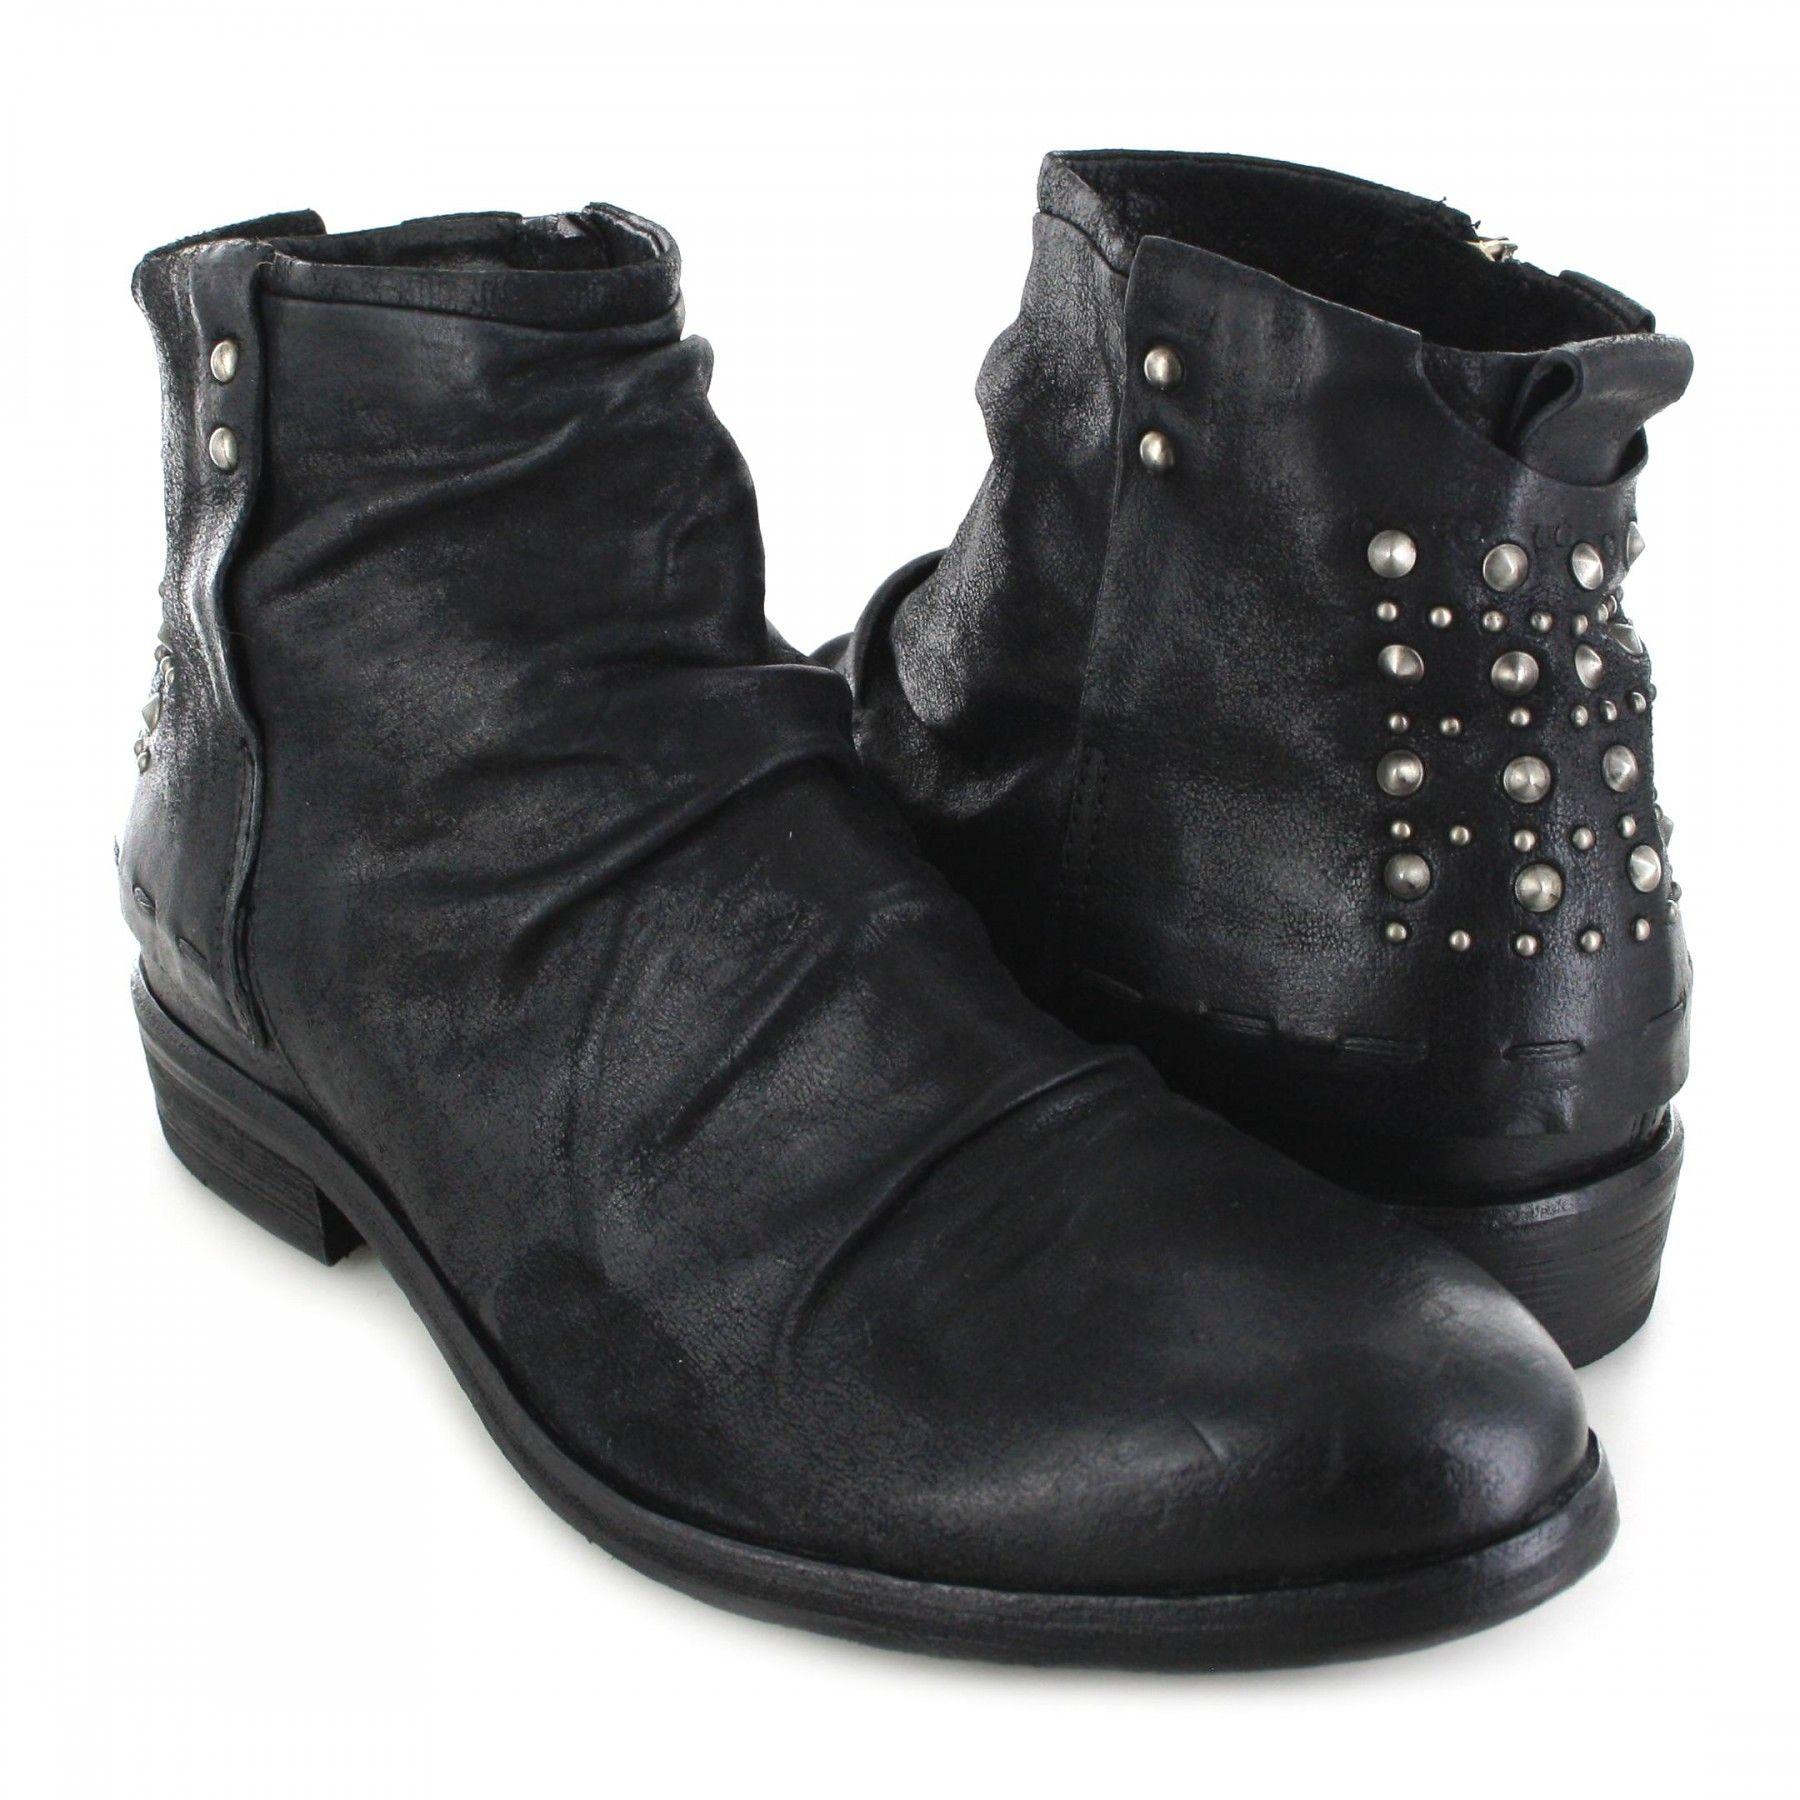 Schwarz Stiefelette 98 Fashion A s Nero Mason 390204 TclFJK1